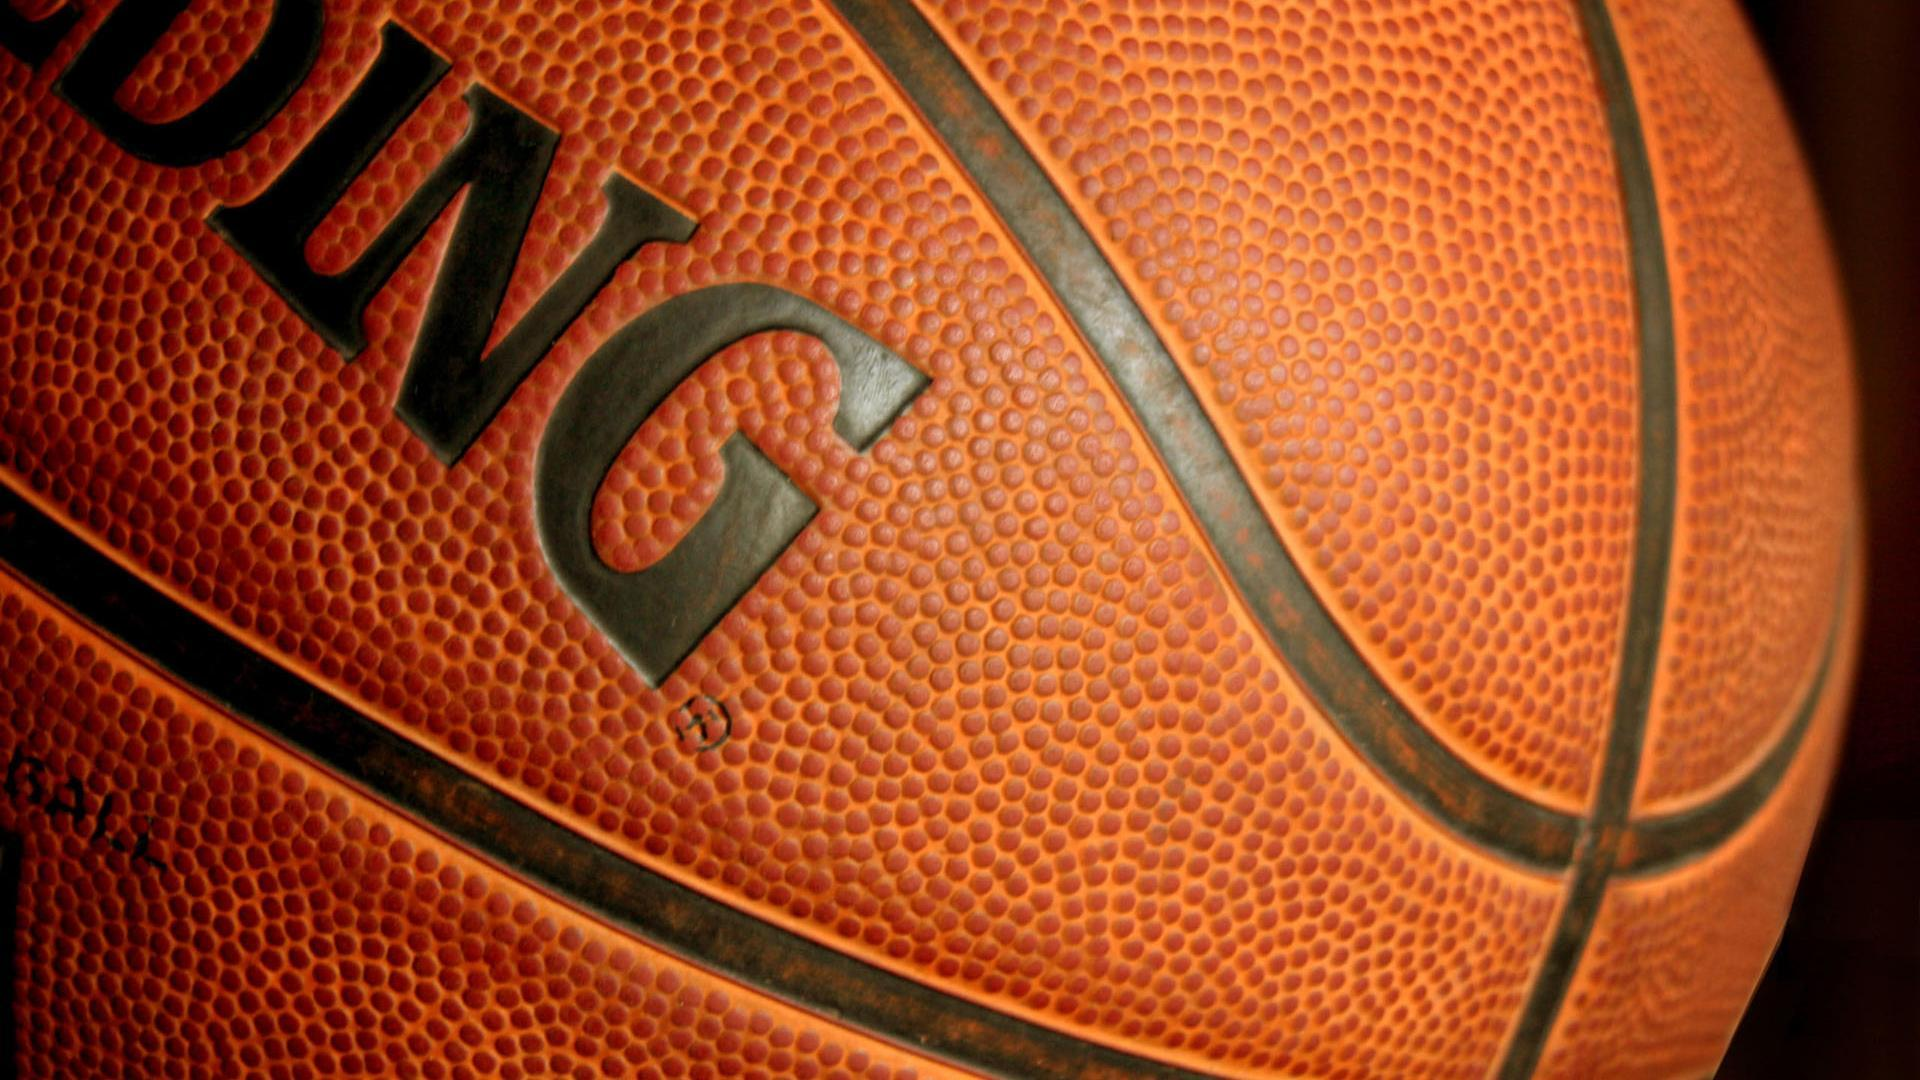 Nike Basketball Wallpaper Creative Nike Basketball Wallpapers